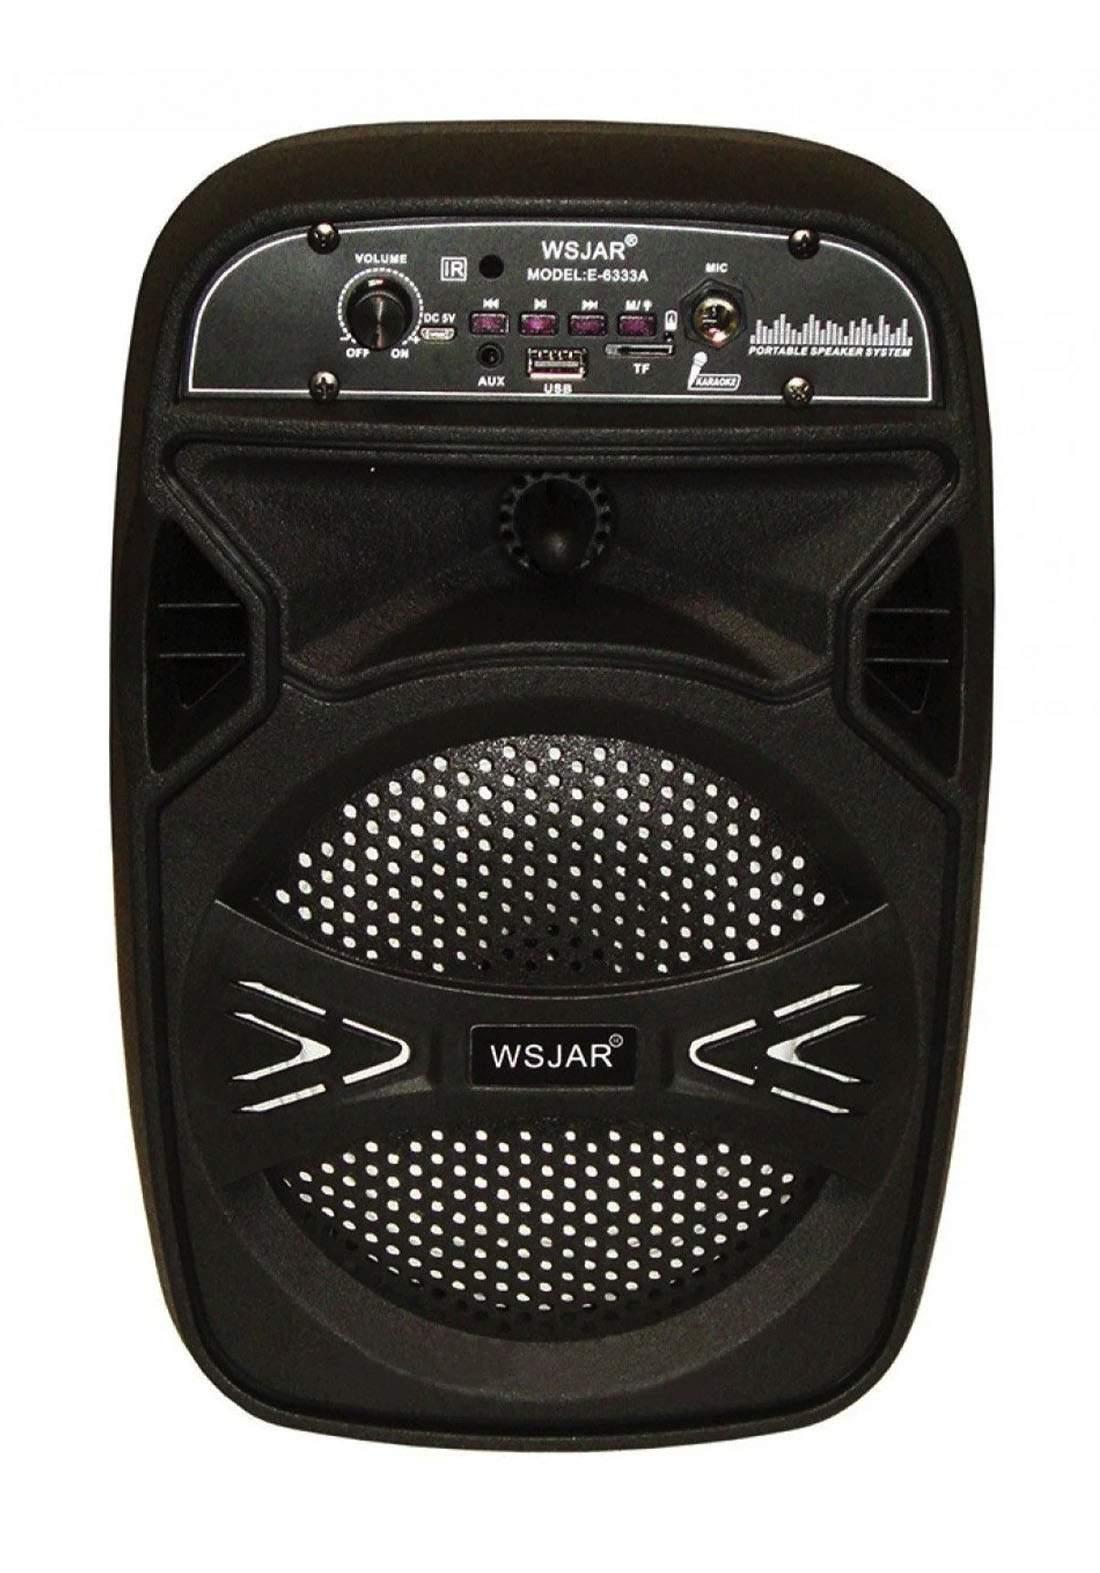 Wsjar E6333A Portable Bluetooth Speaker - Black مكبر صوت